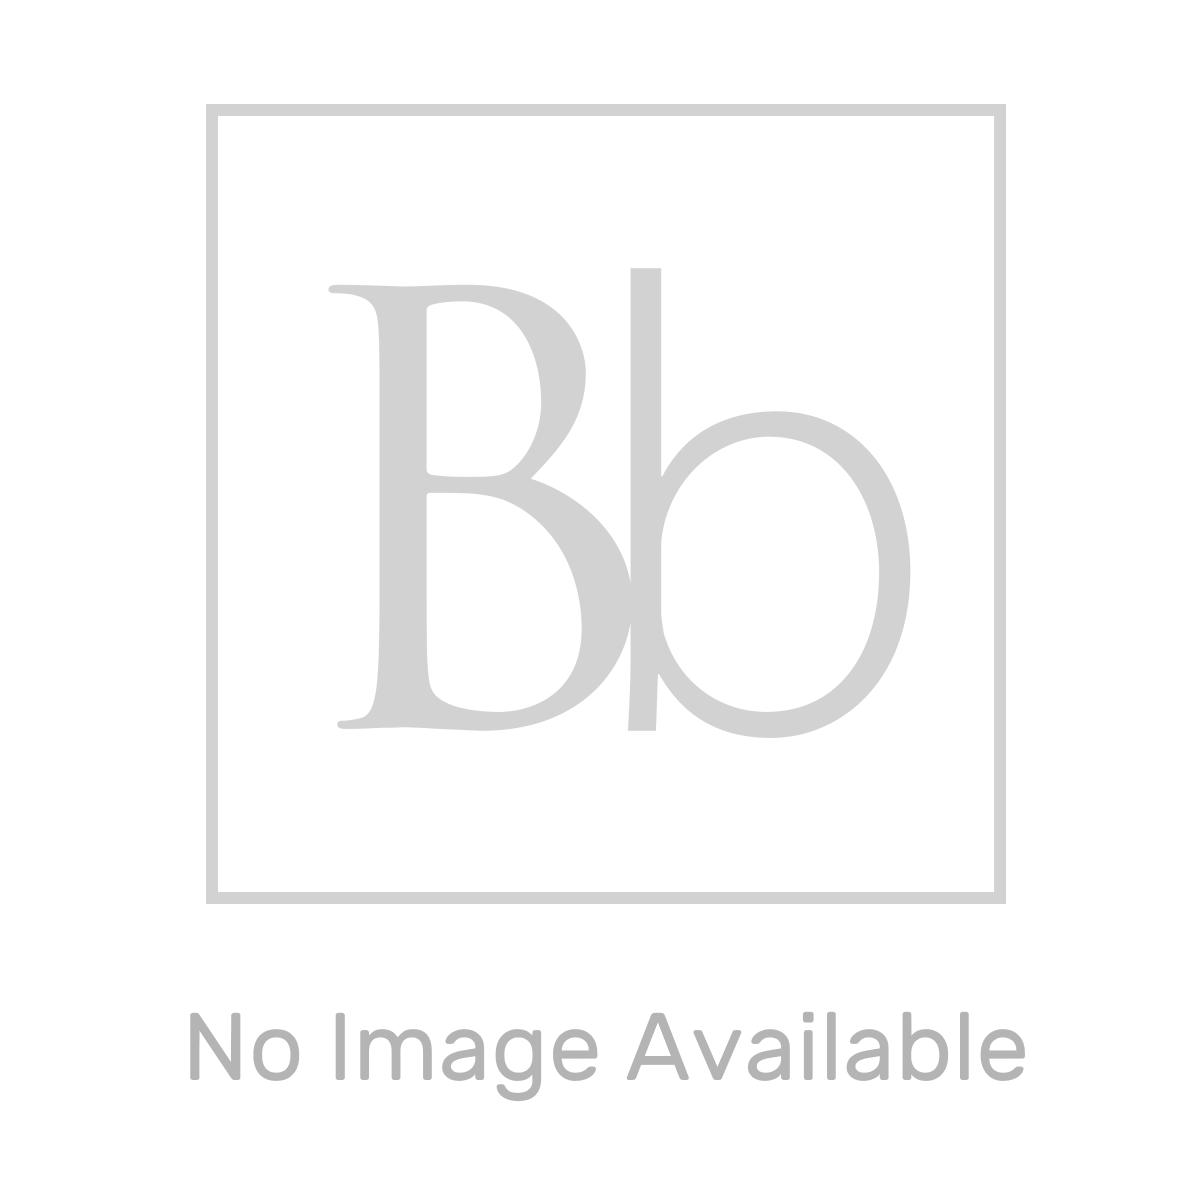 Zenith Form Bath Shower Mixer Tap